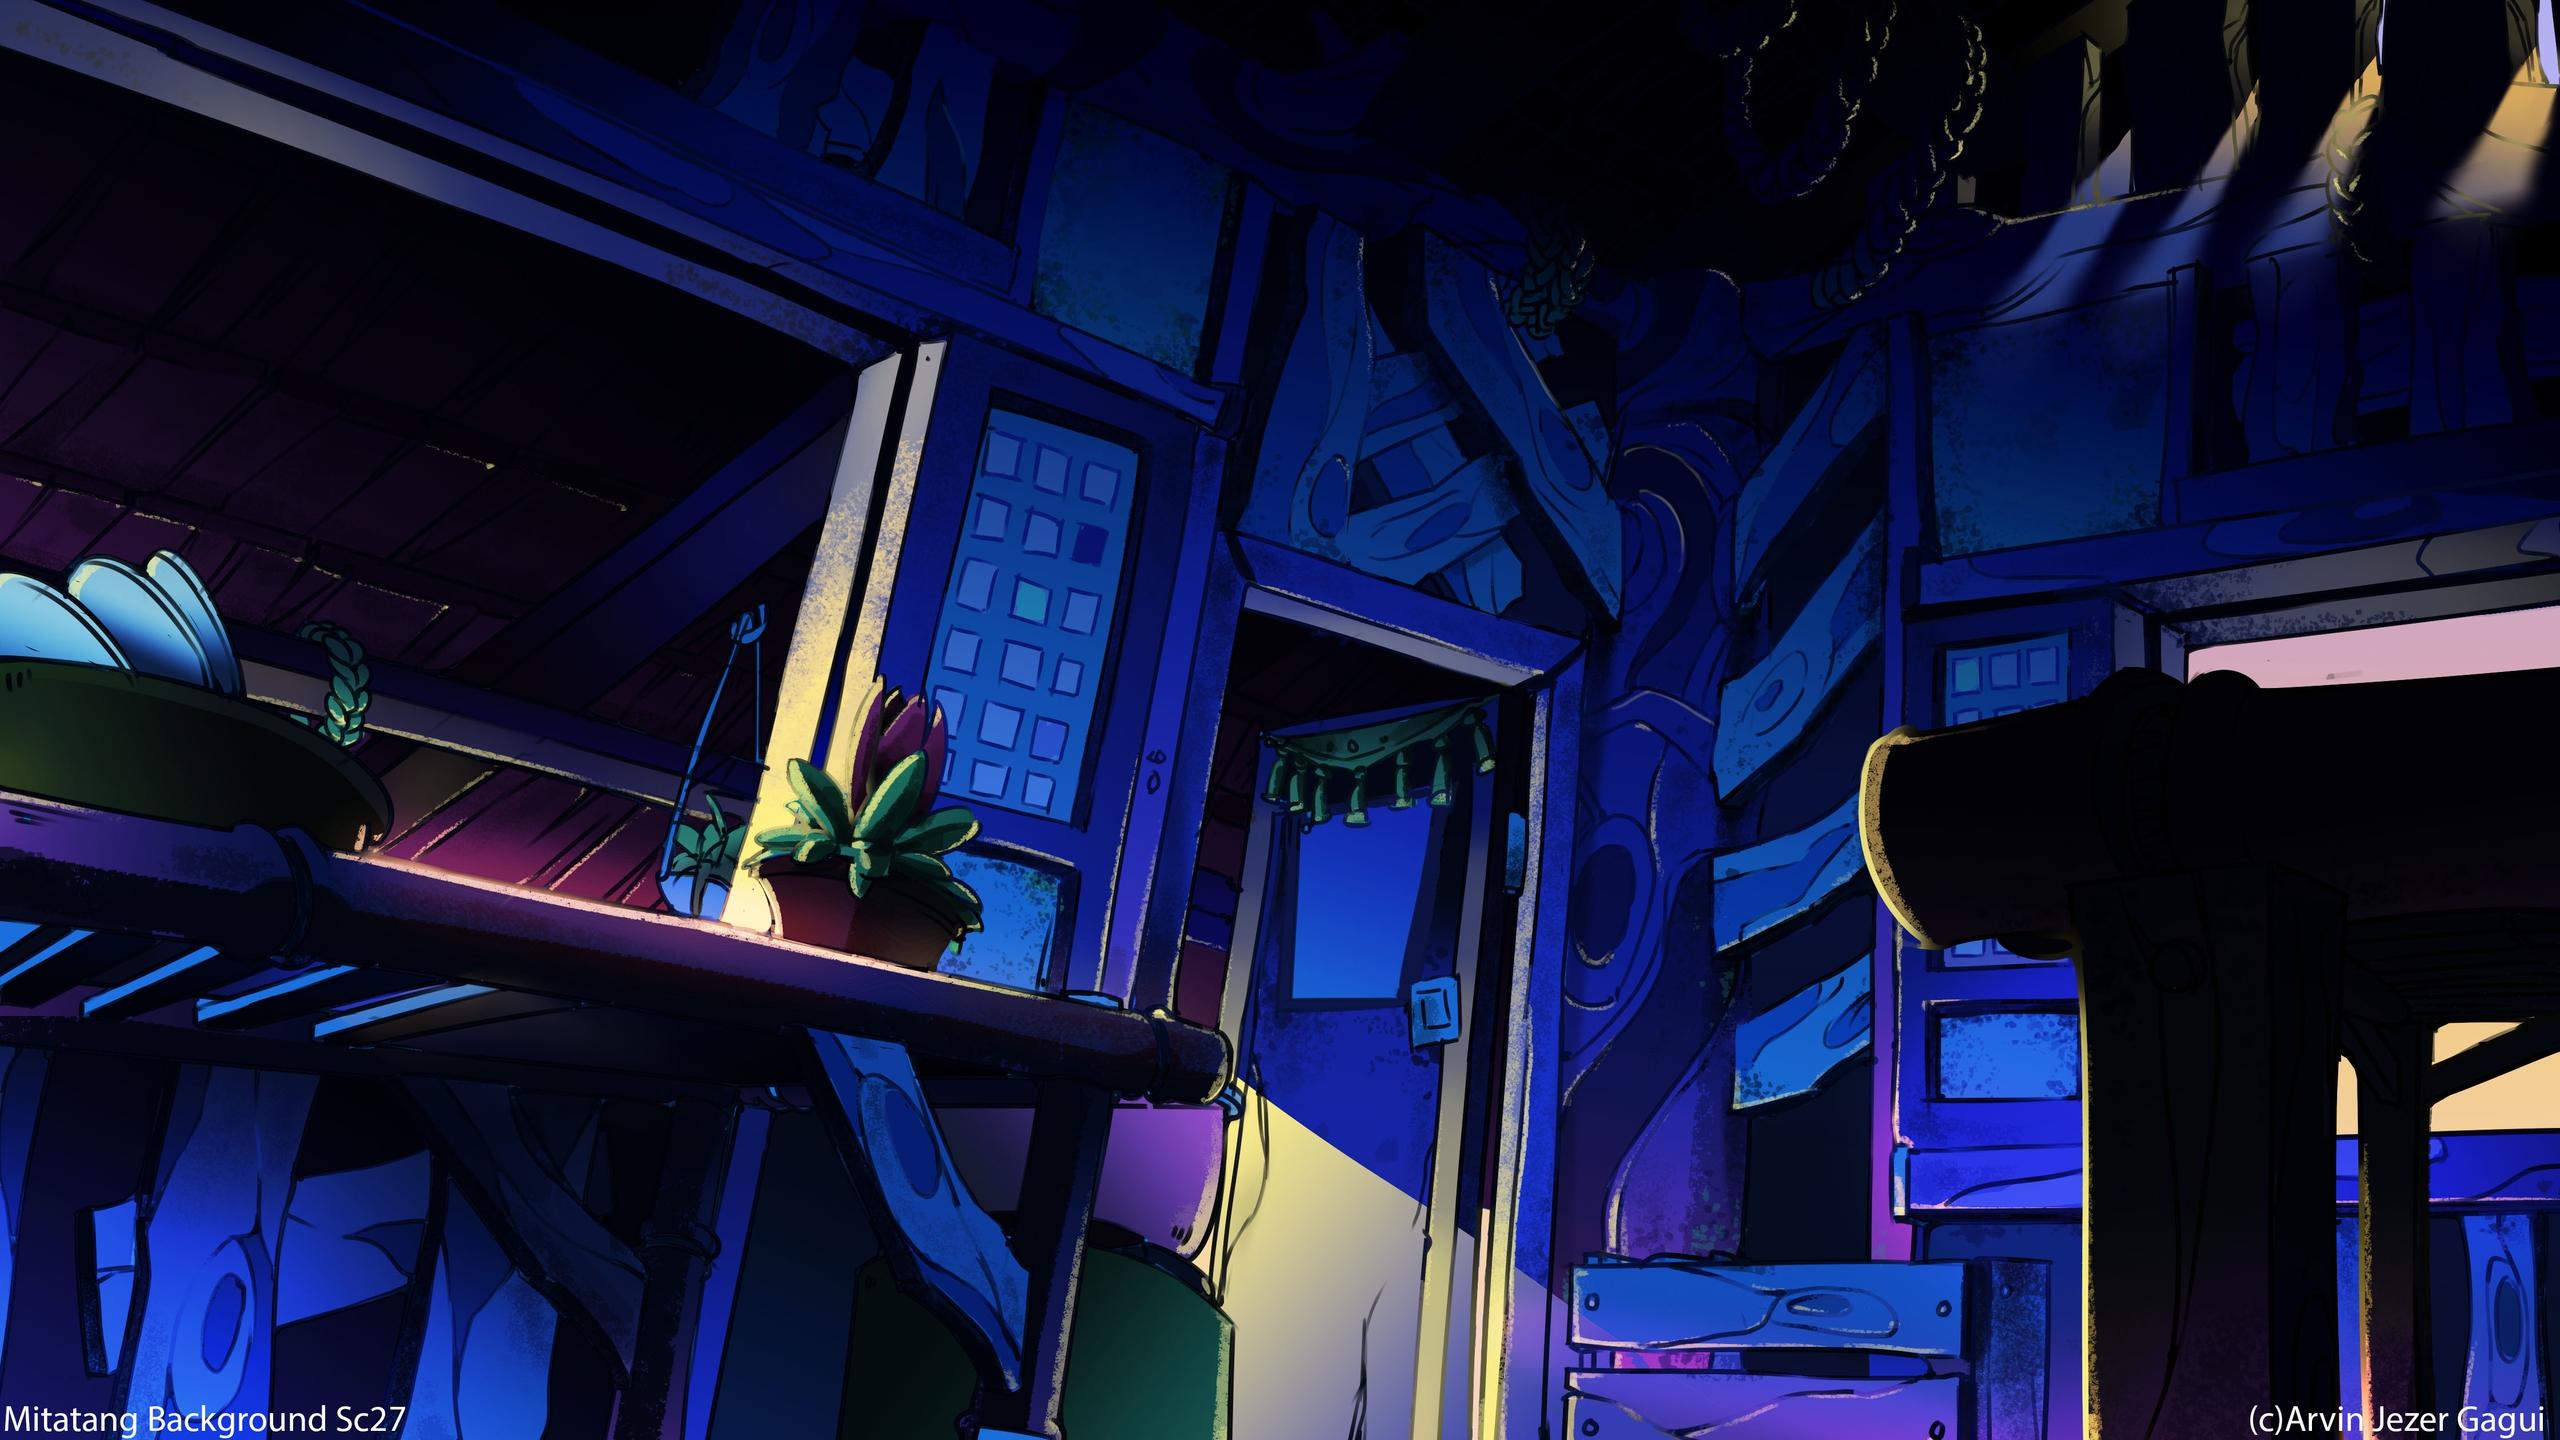 Nipa Hut Interior Background - drawing - arvinjezergagui | ello